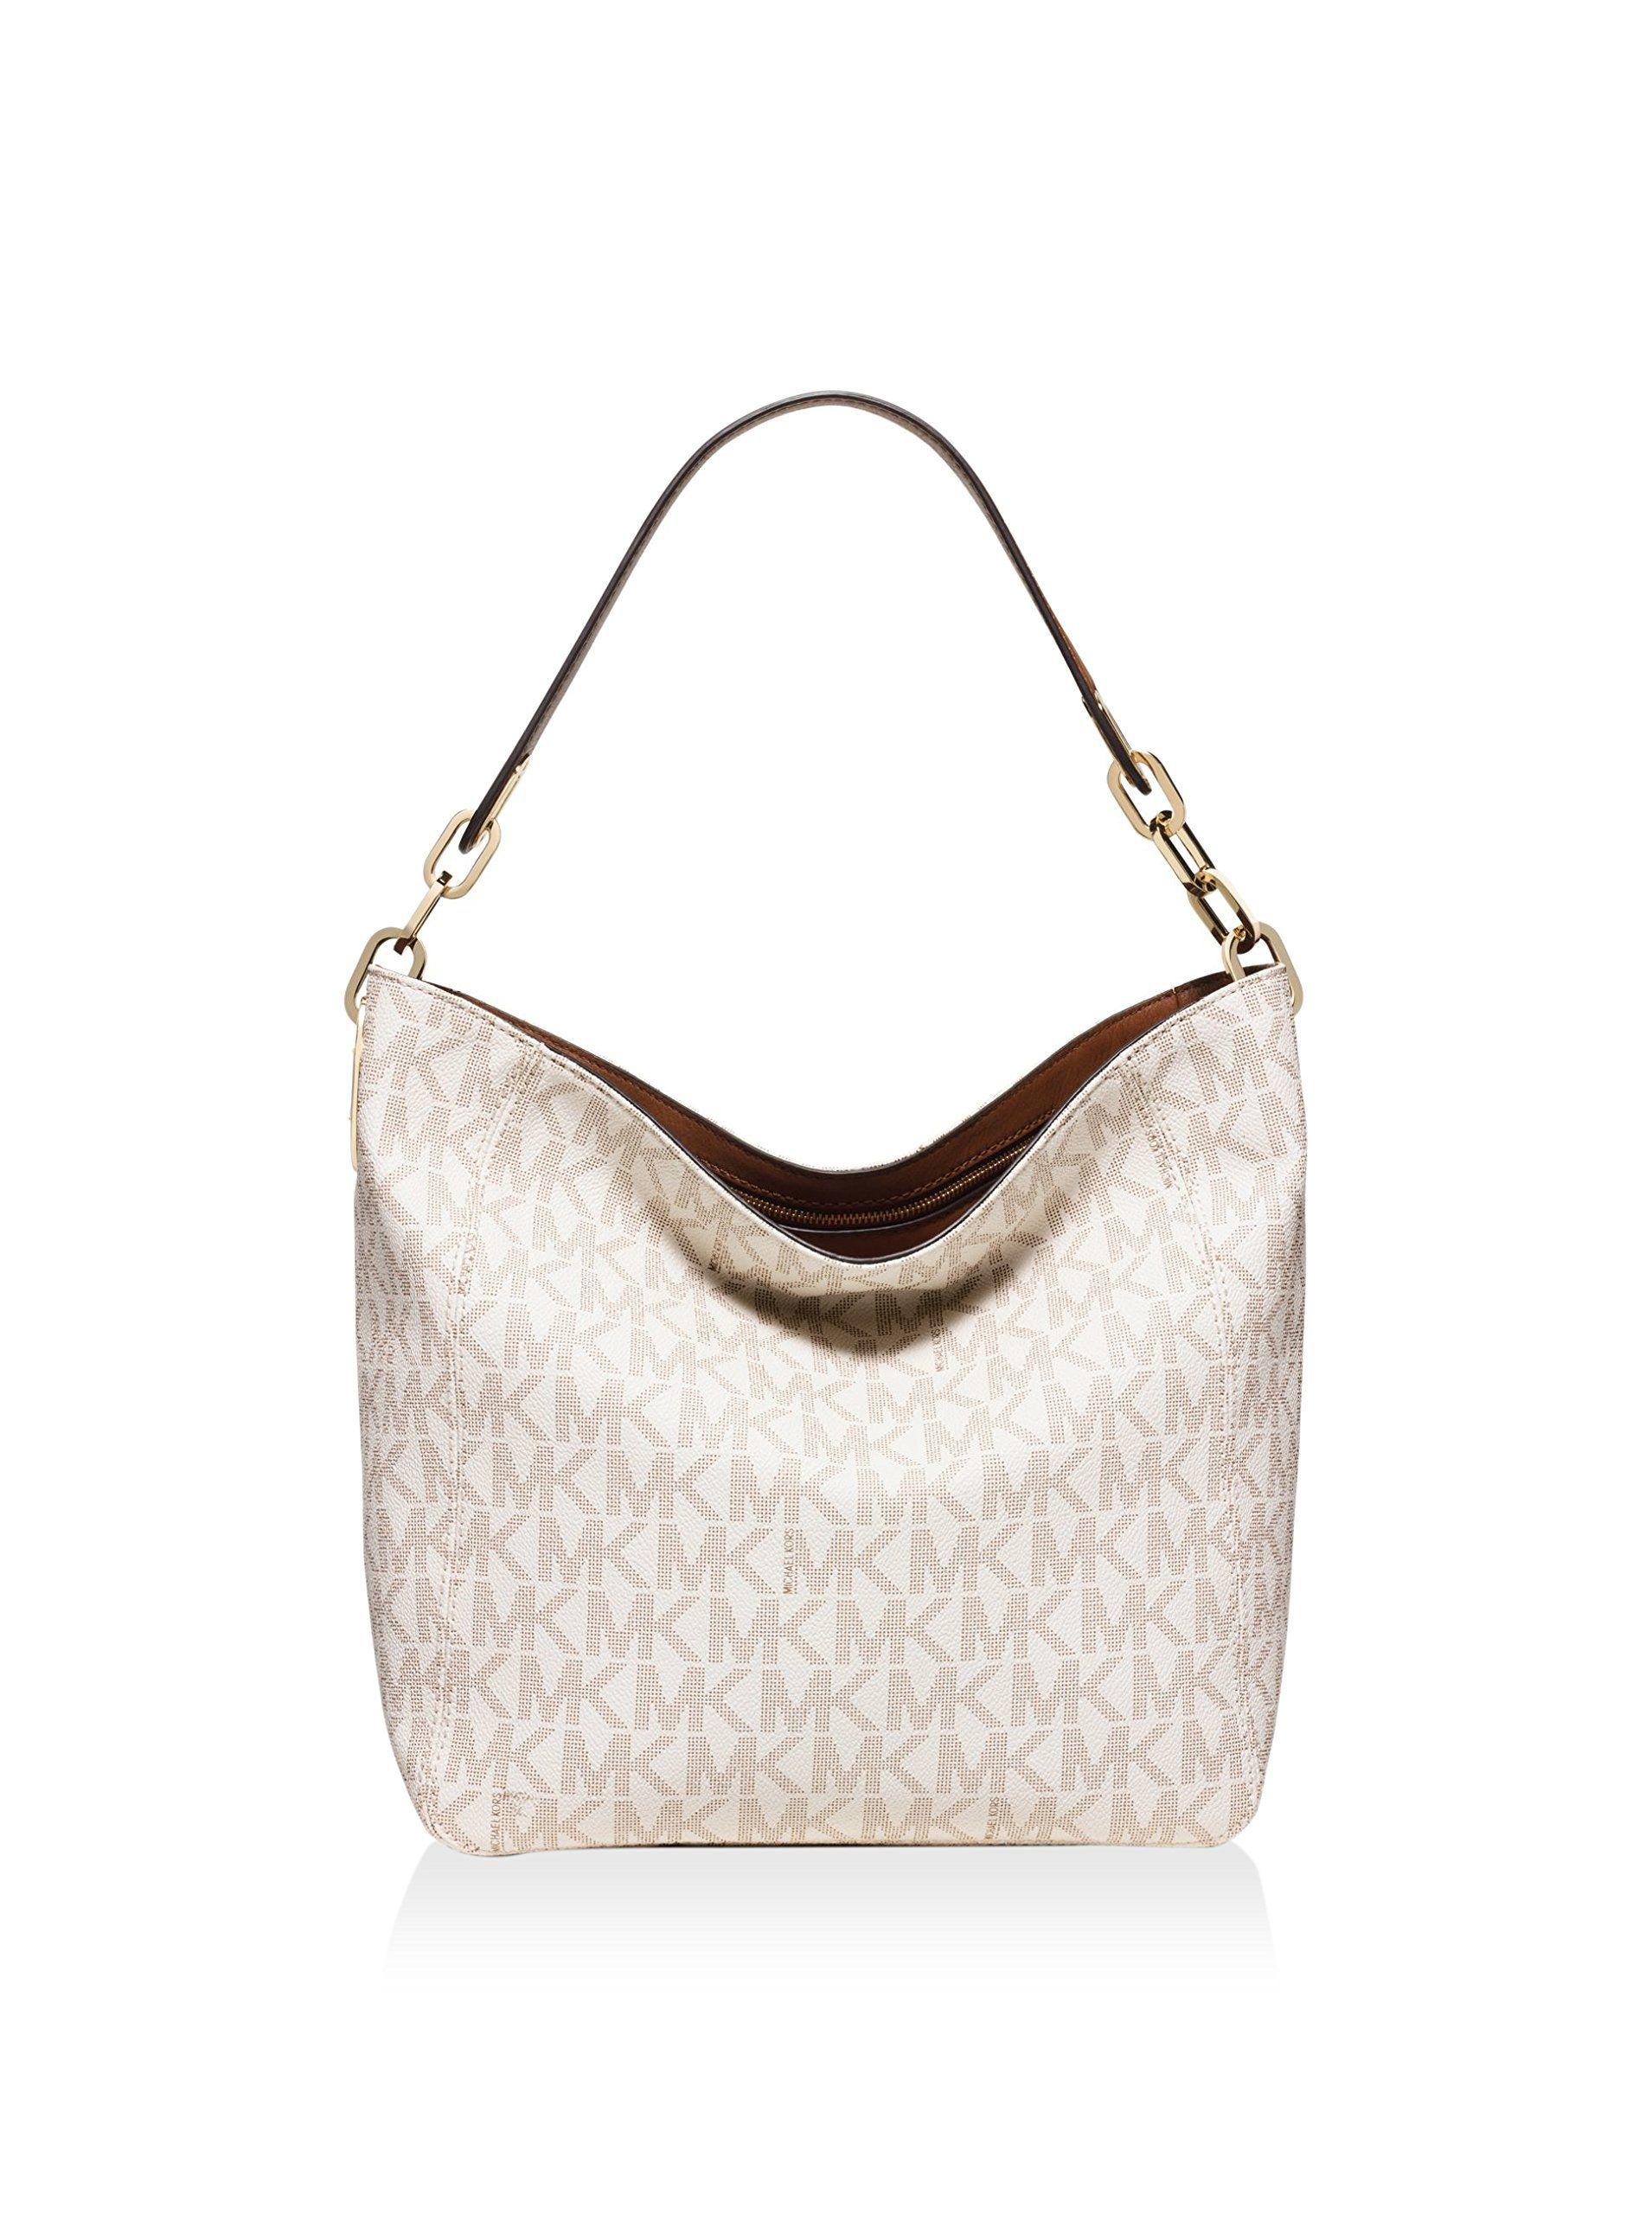 Michael Kors Fulton Medium Leather Shoulder Bag- Vanilla